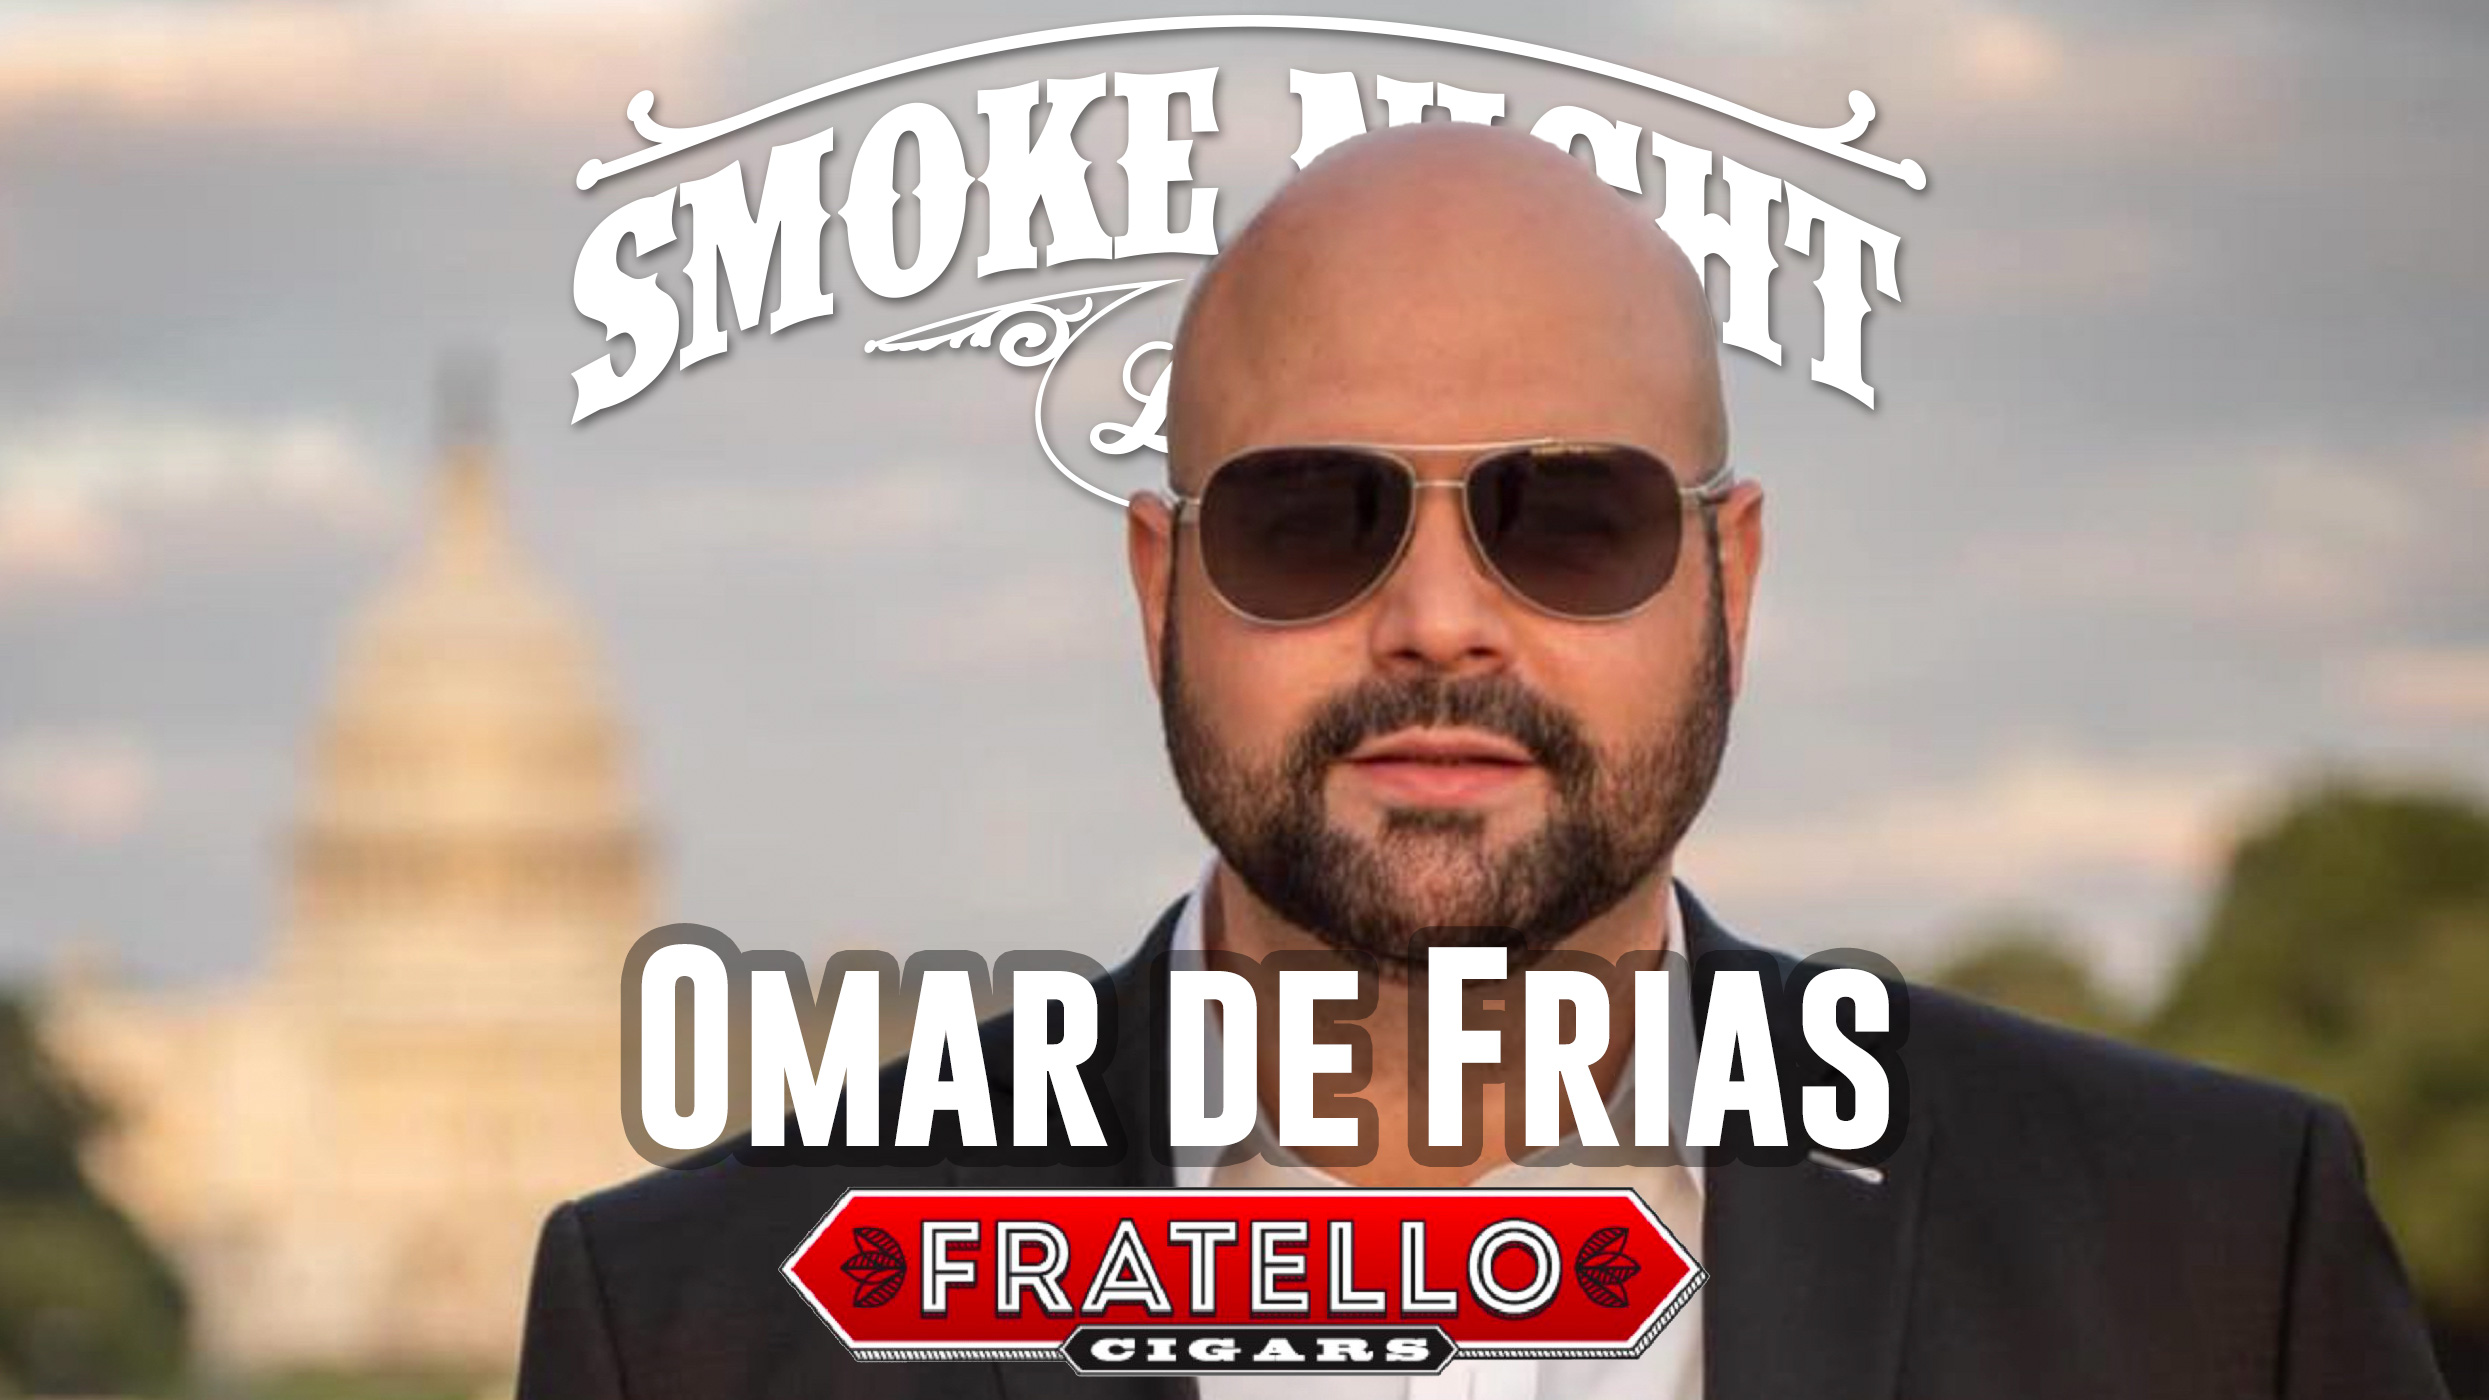 Omar de Frias Fratello Cigars